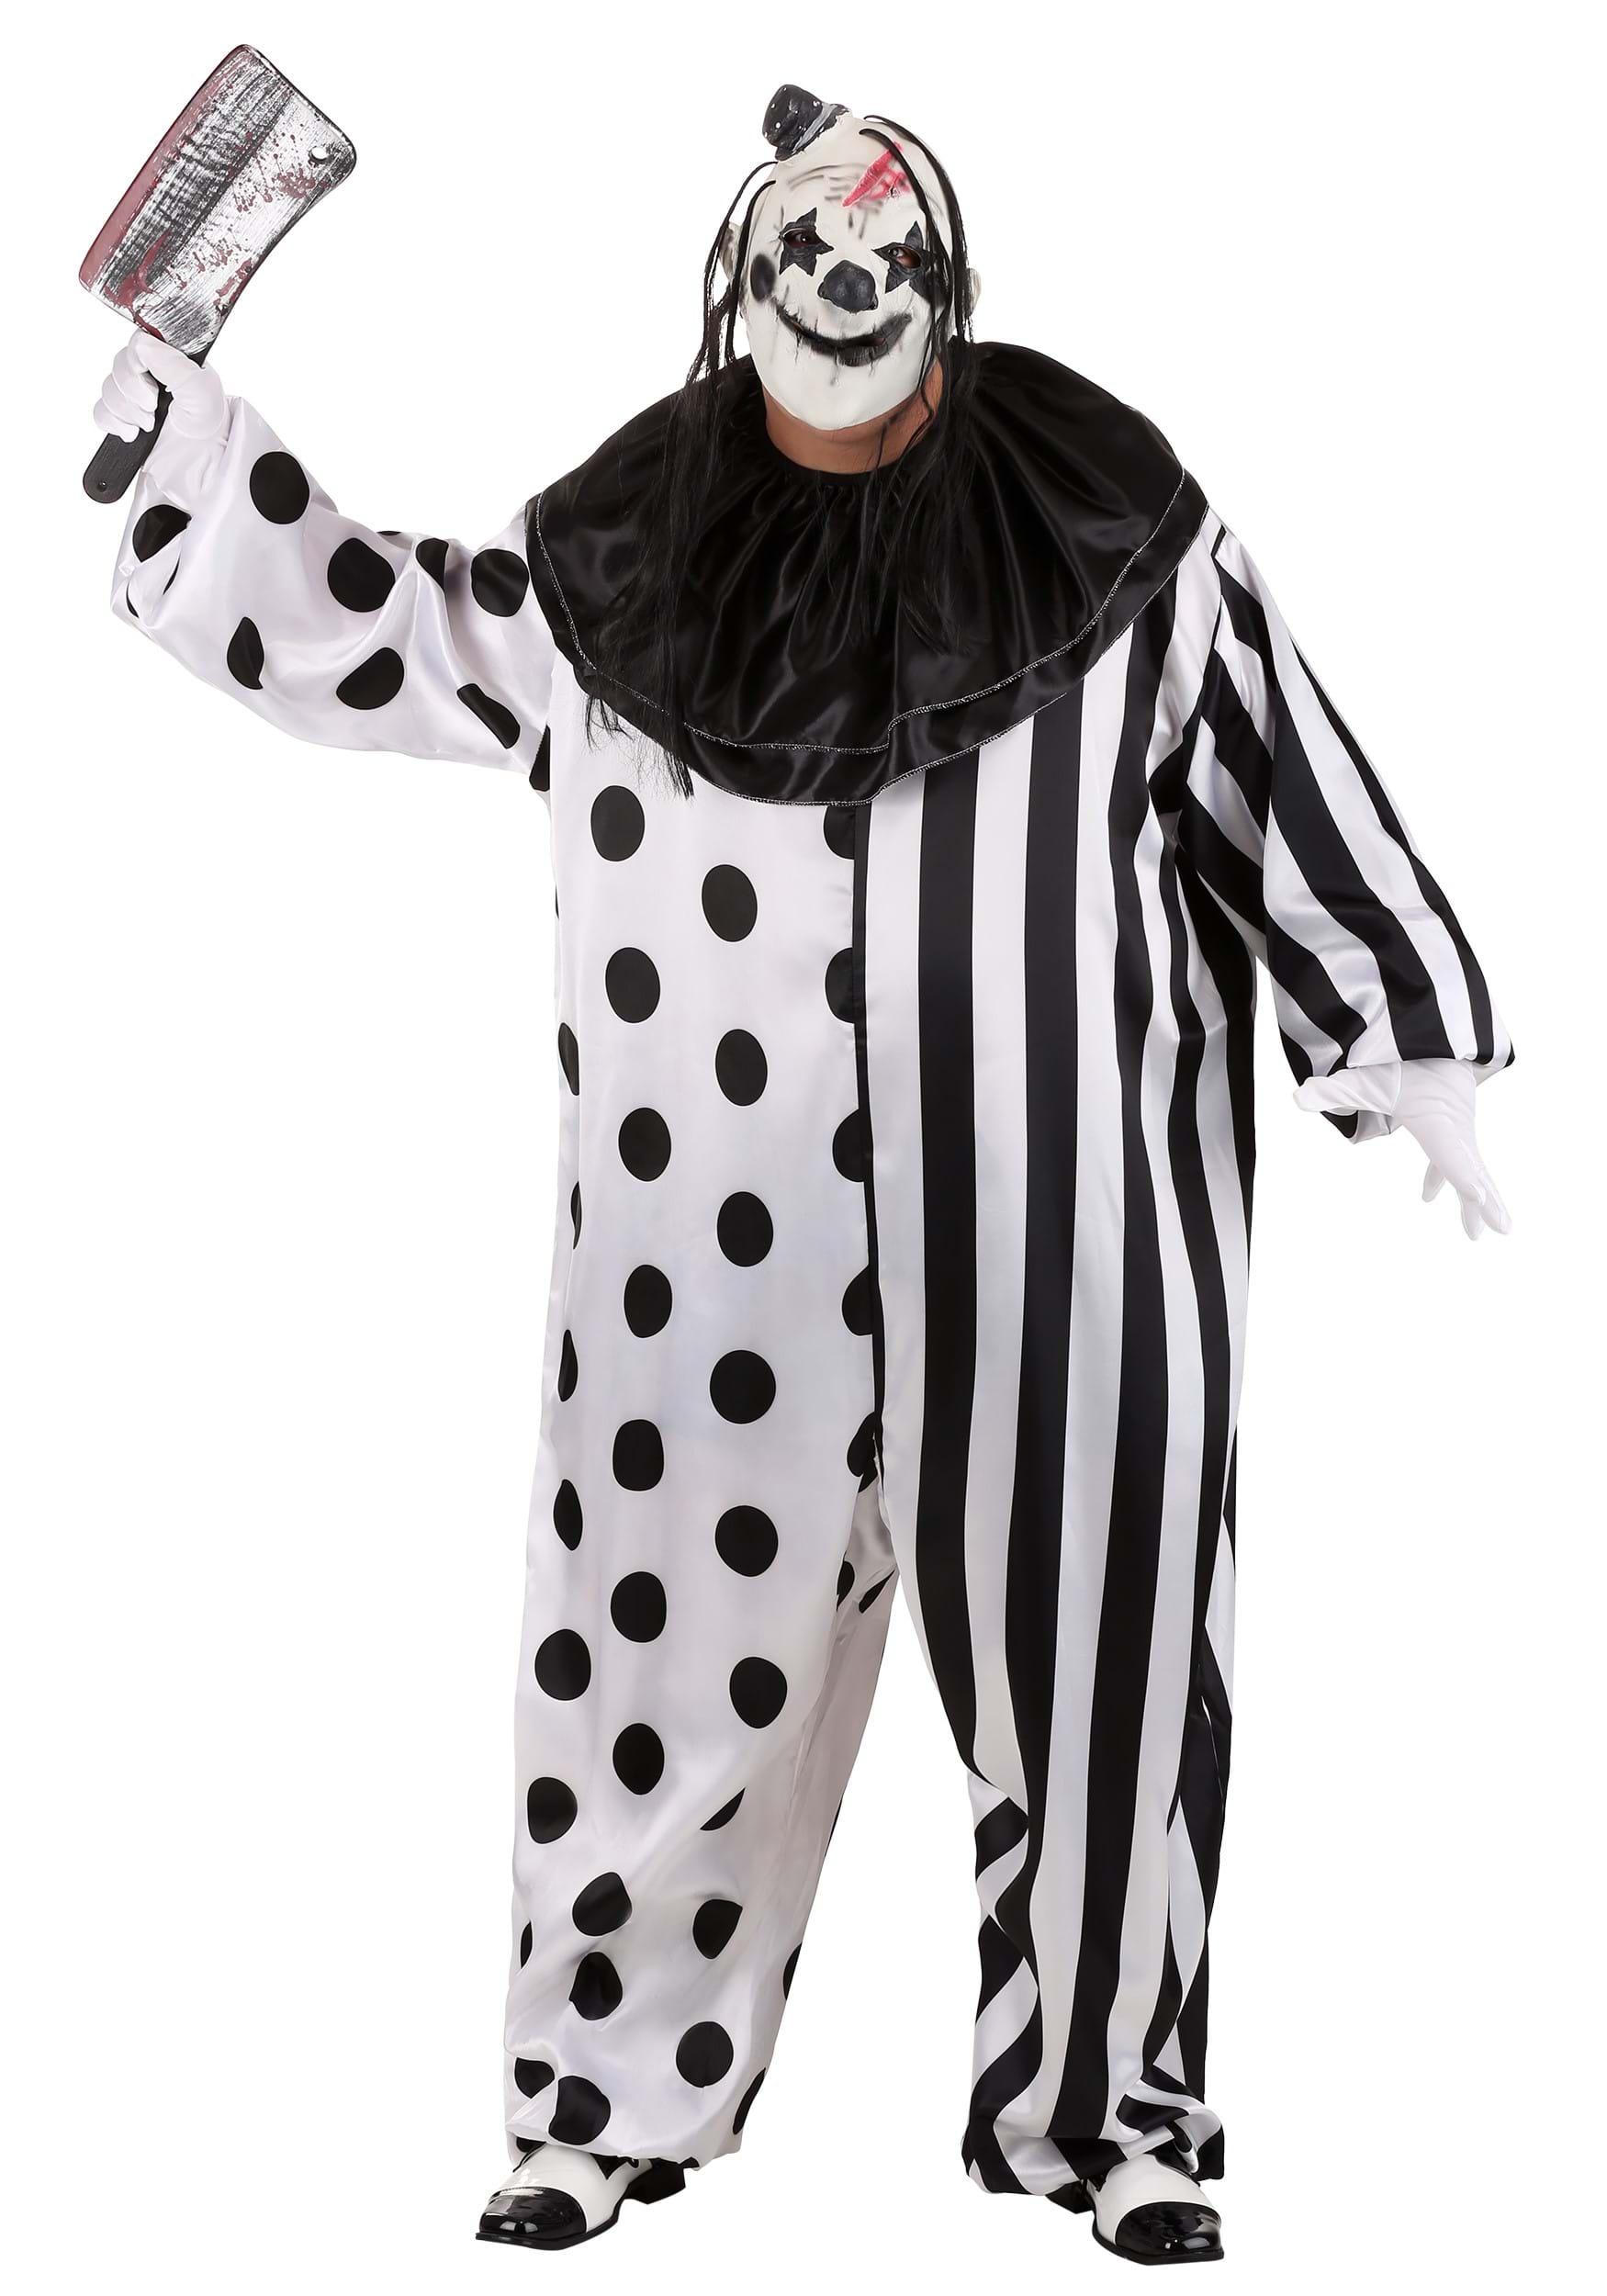 killer clown plus size costume. Black Bedroom Furniture Sets. Home Design Ideas